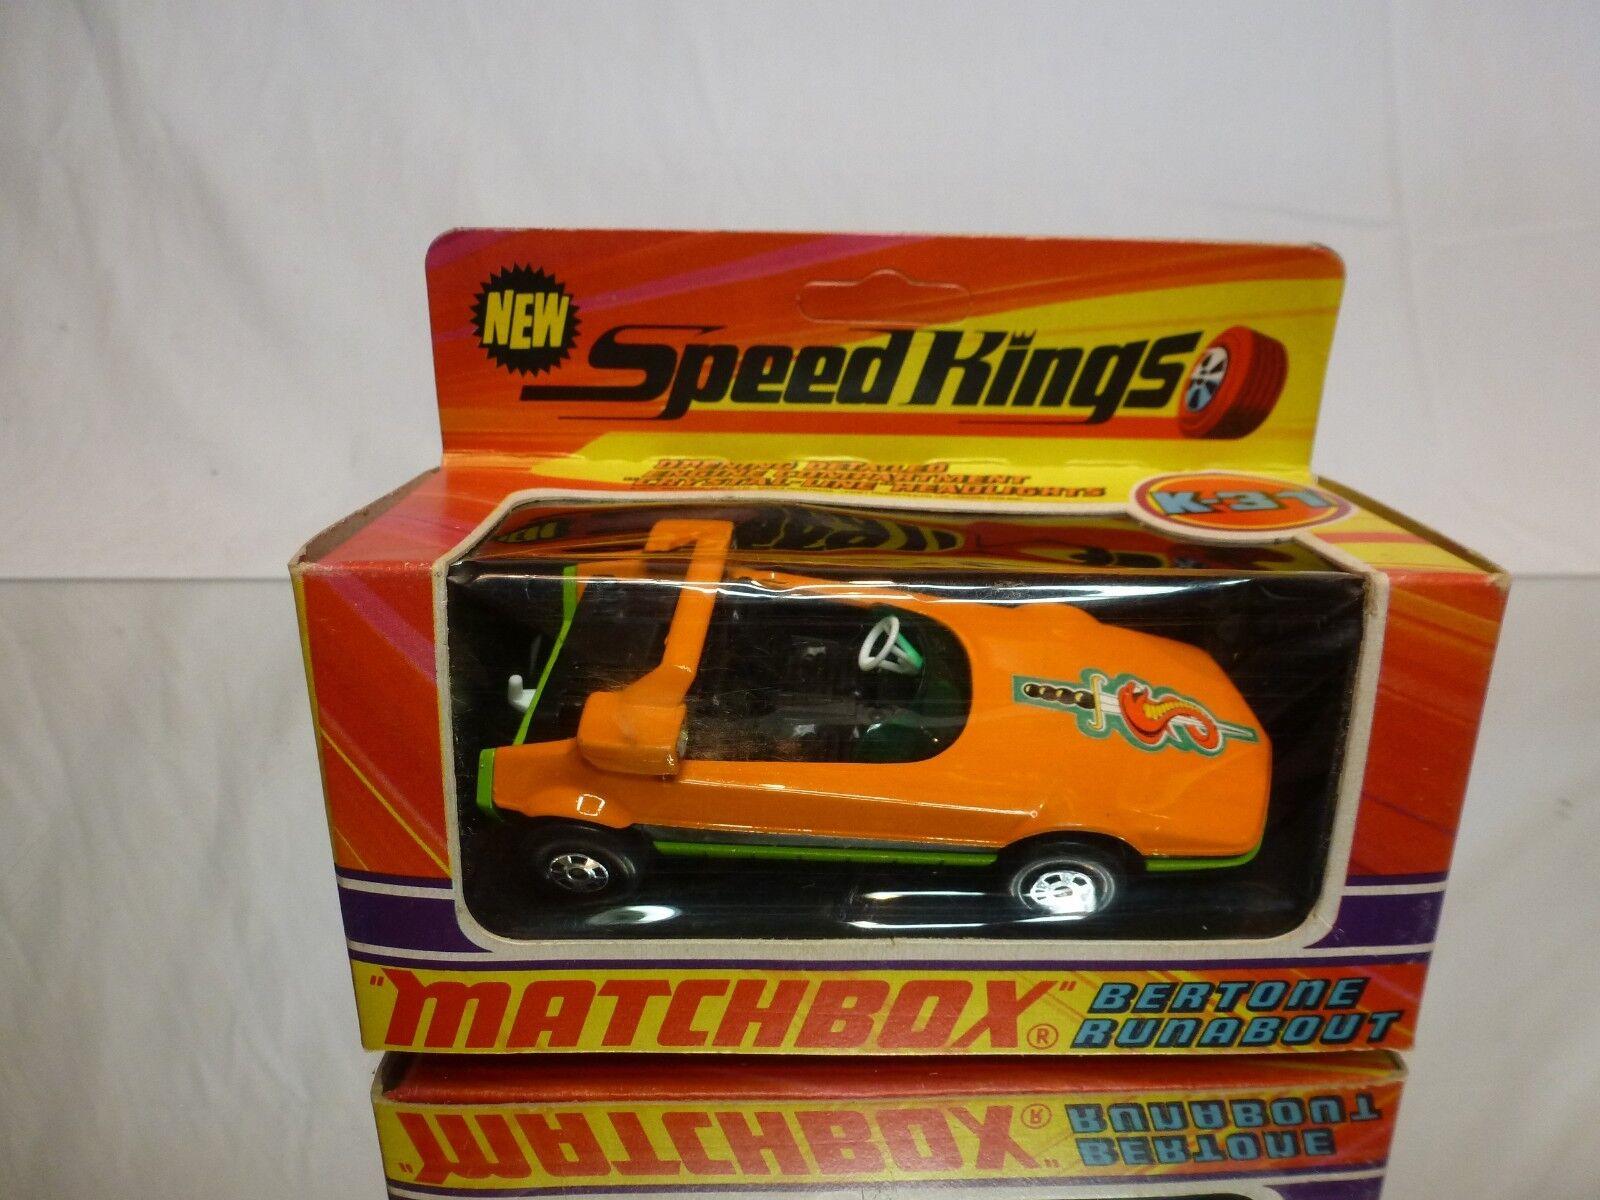 MATCHBOX K31 K-31 BERTONE RUNABOUT (predo fiat x1 9) - orange 1 43 - GOOD IN BOX